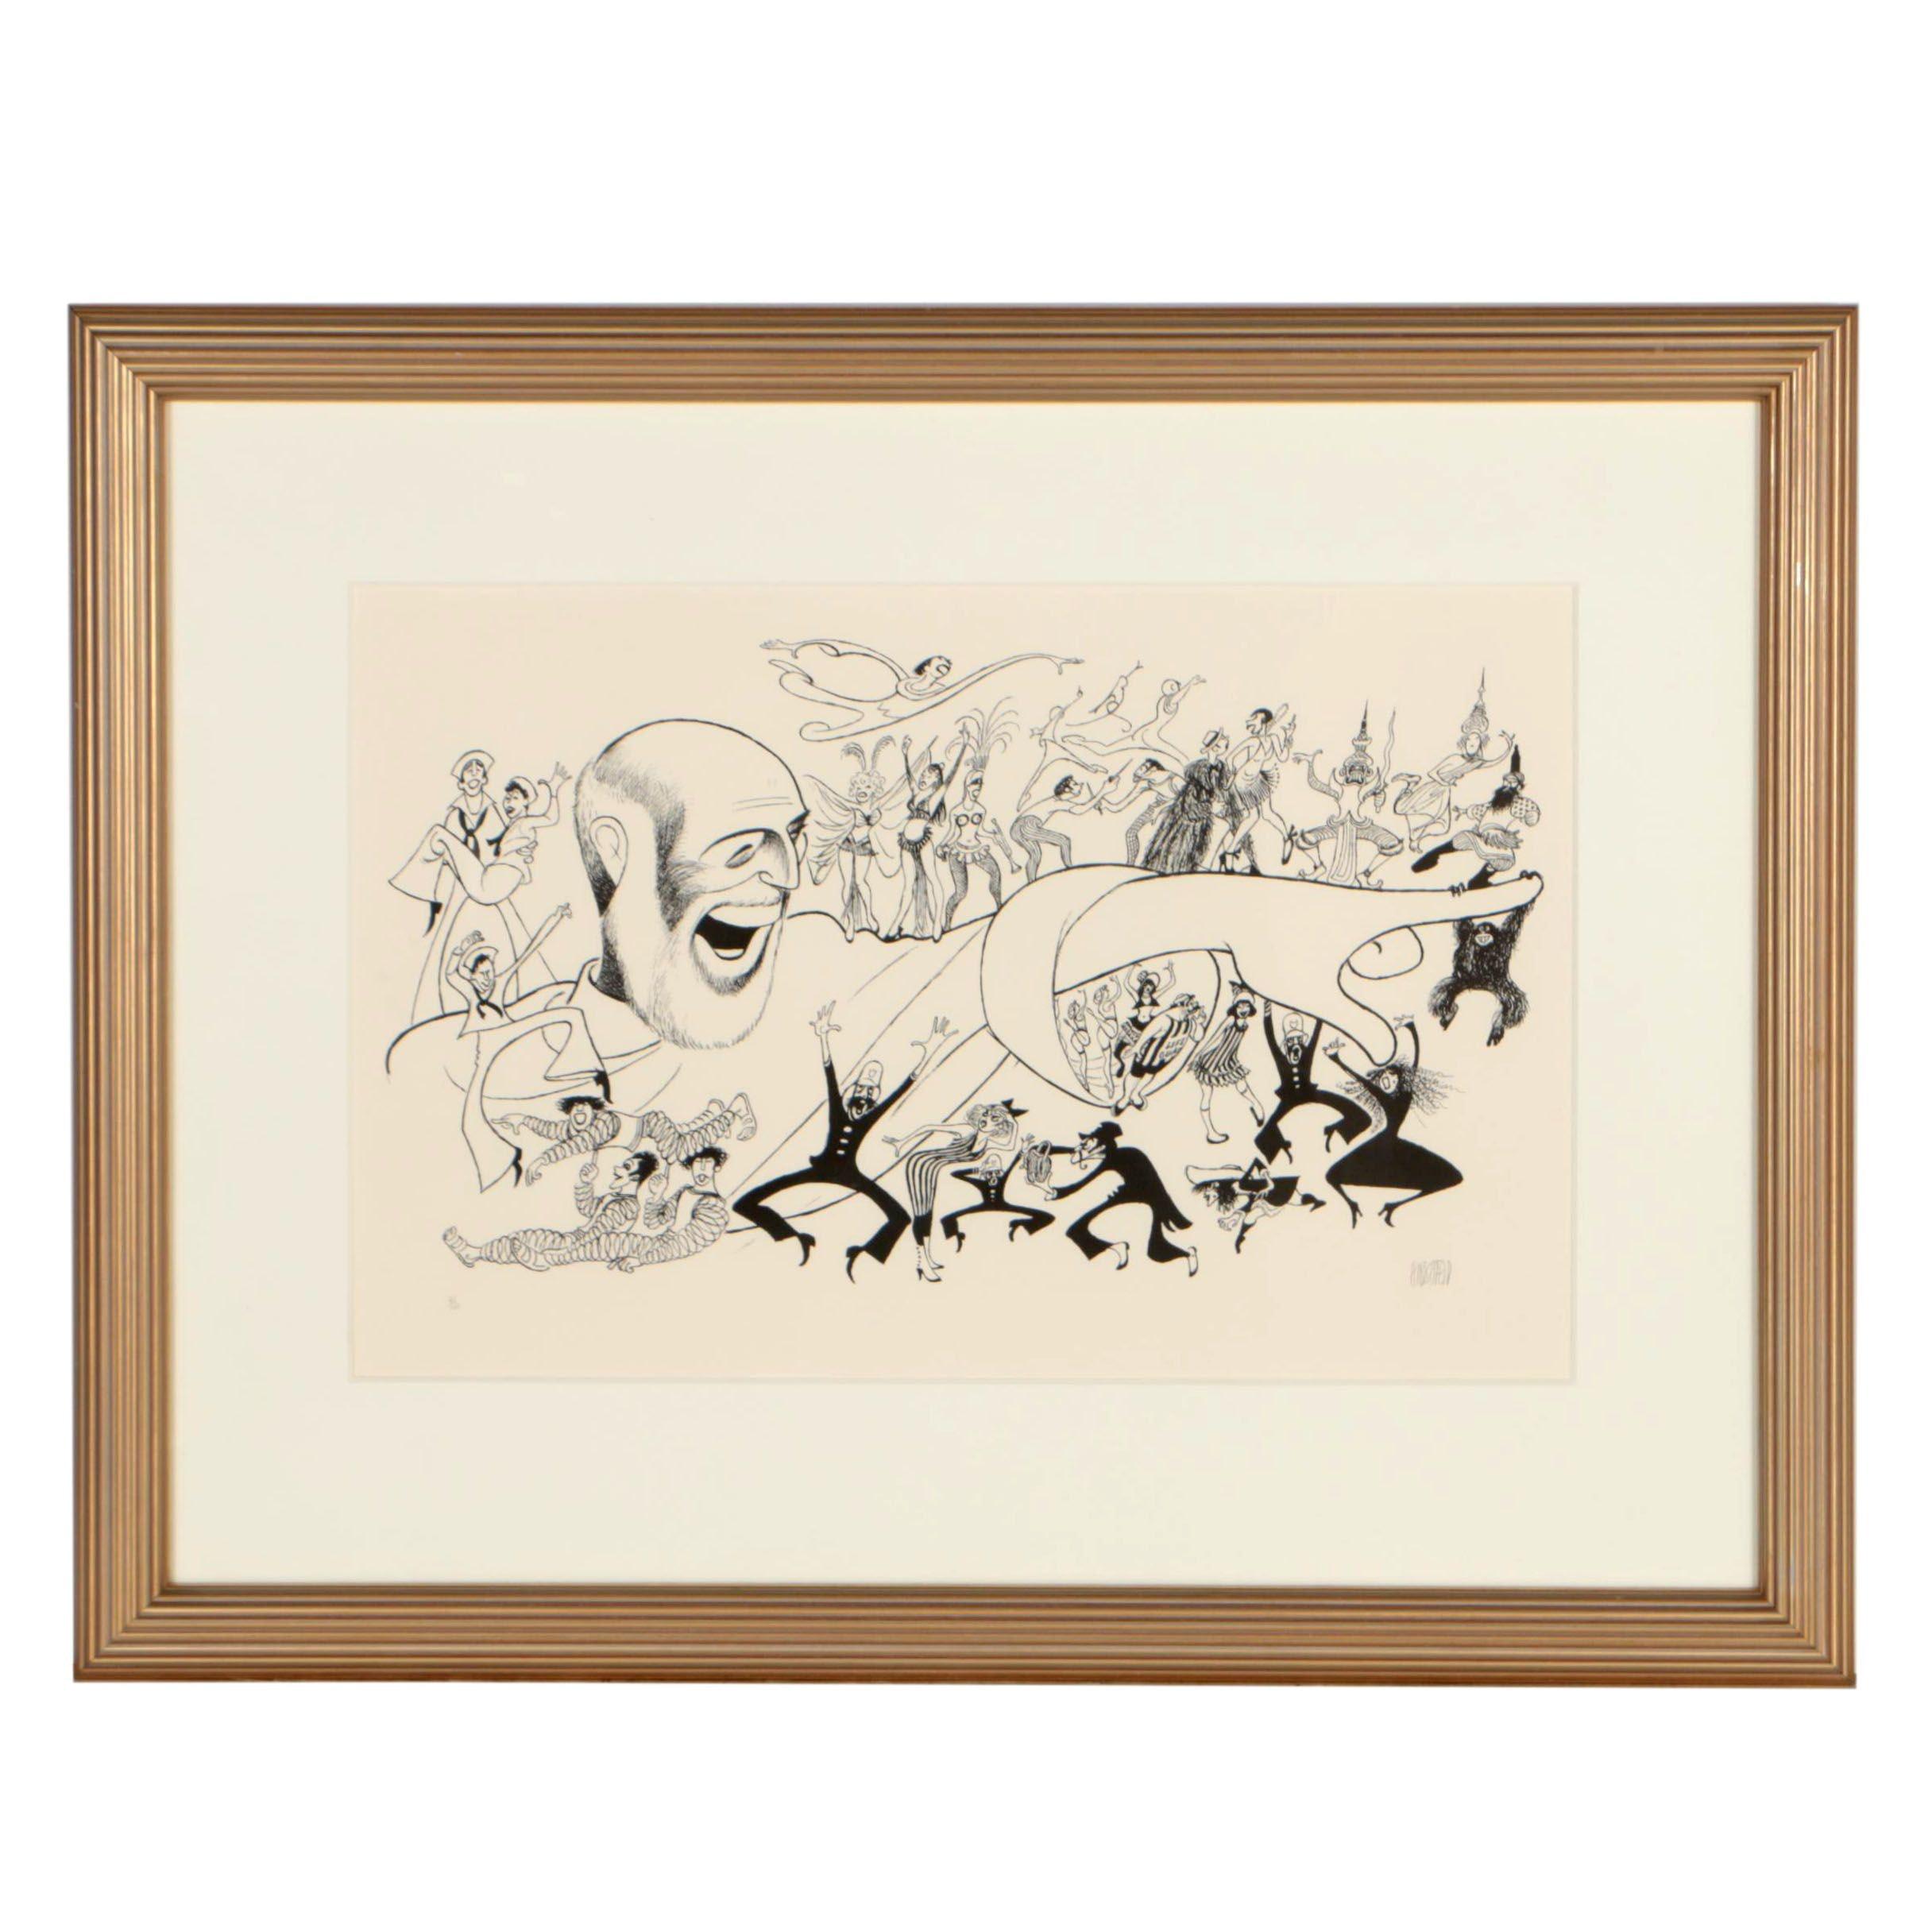 "Albert Hirschfeld Lithograph ""Jerome Robbins' Broadway"", 1989"